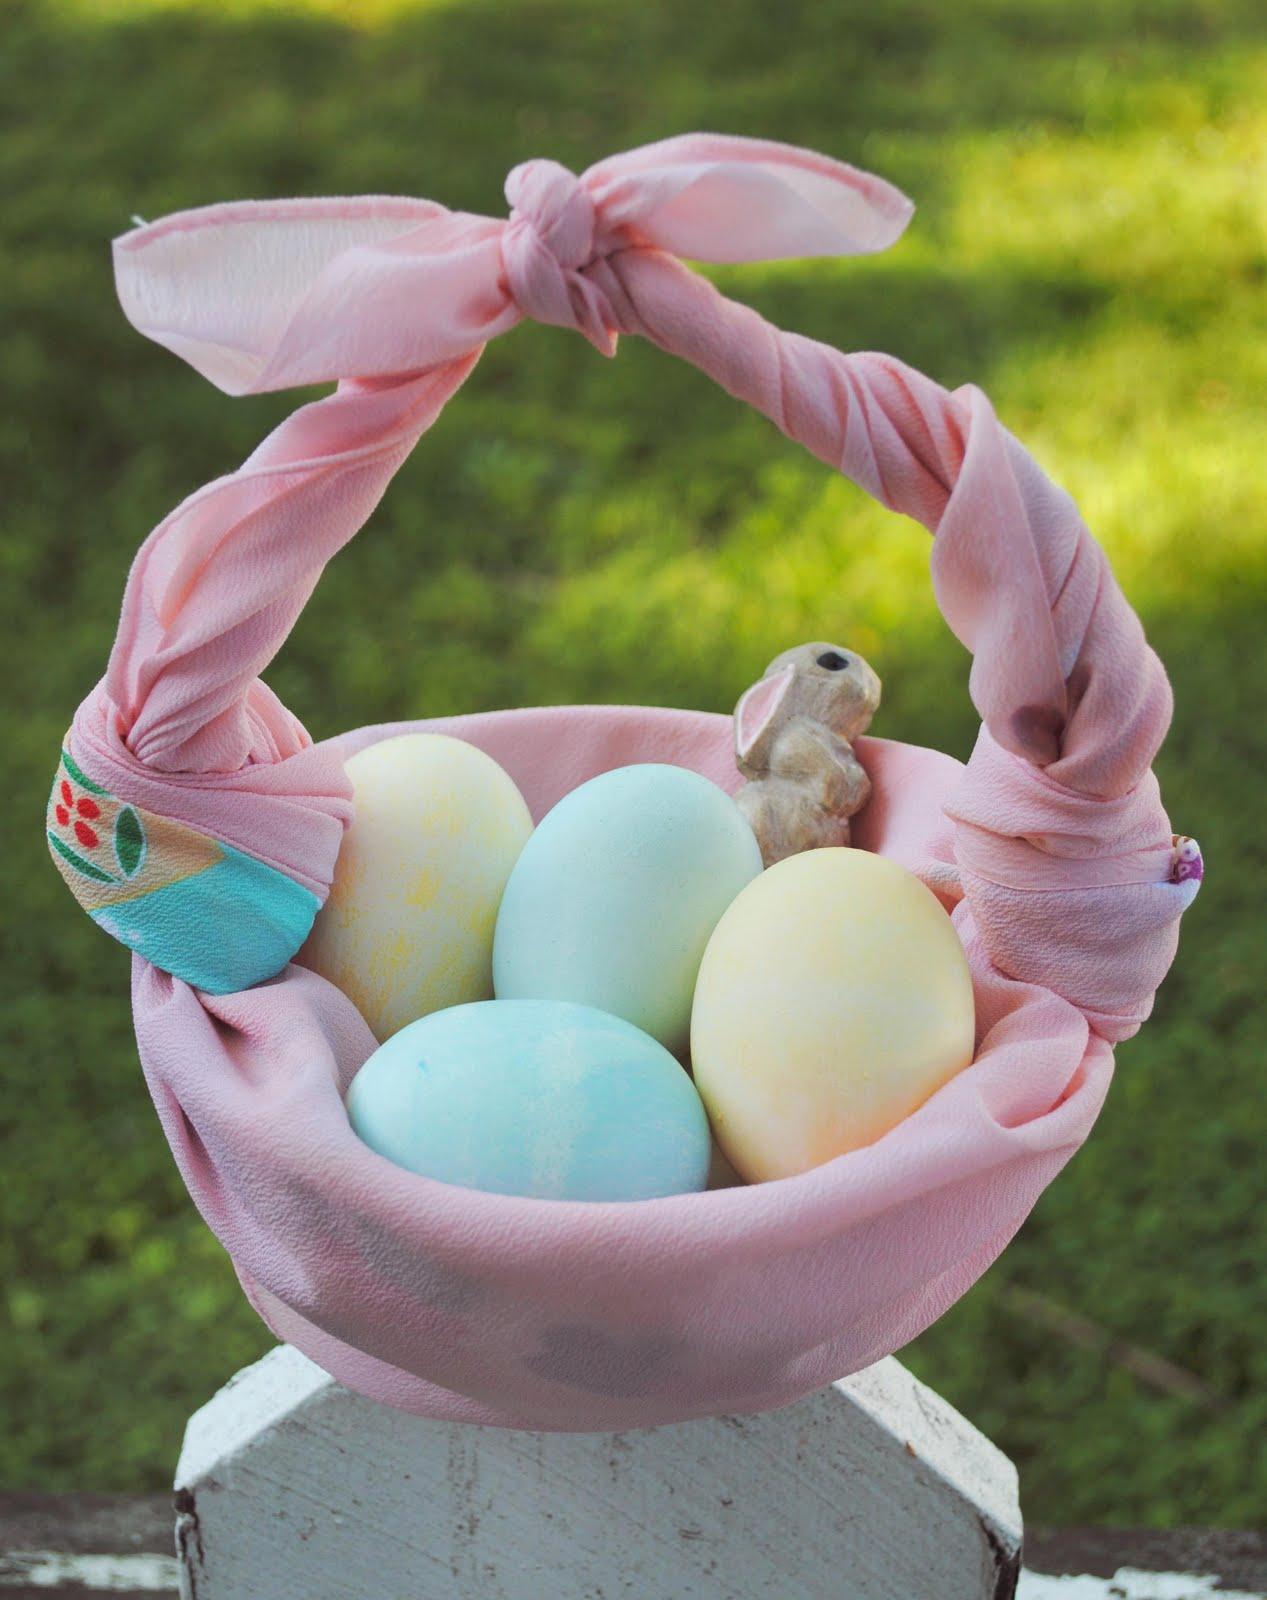 http://3.bp.blogspot.com/-K6kIltUxz1E/TaJMngK4Y1I/AAAAAAAAGIA/SK2m7zkRZvQ/s1600/Easter%2Bbasket%2Bcraft%2B6.jpg